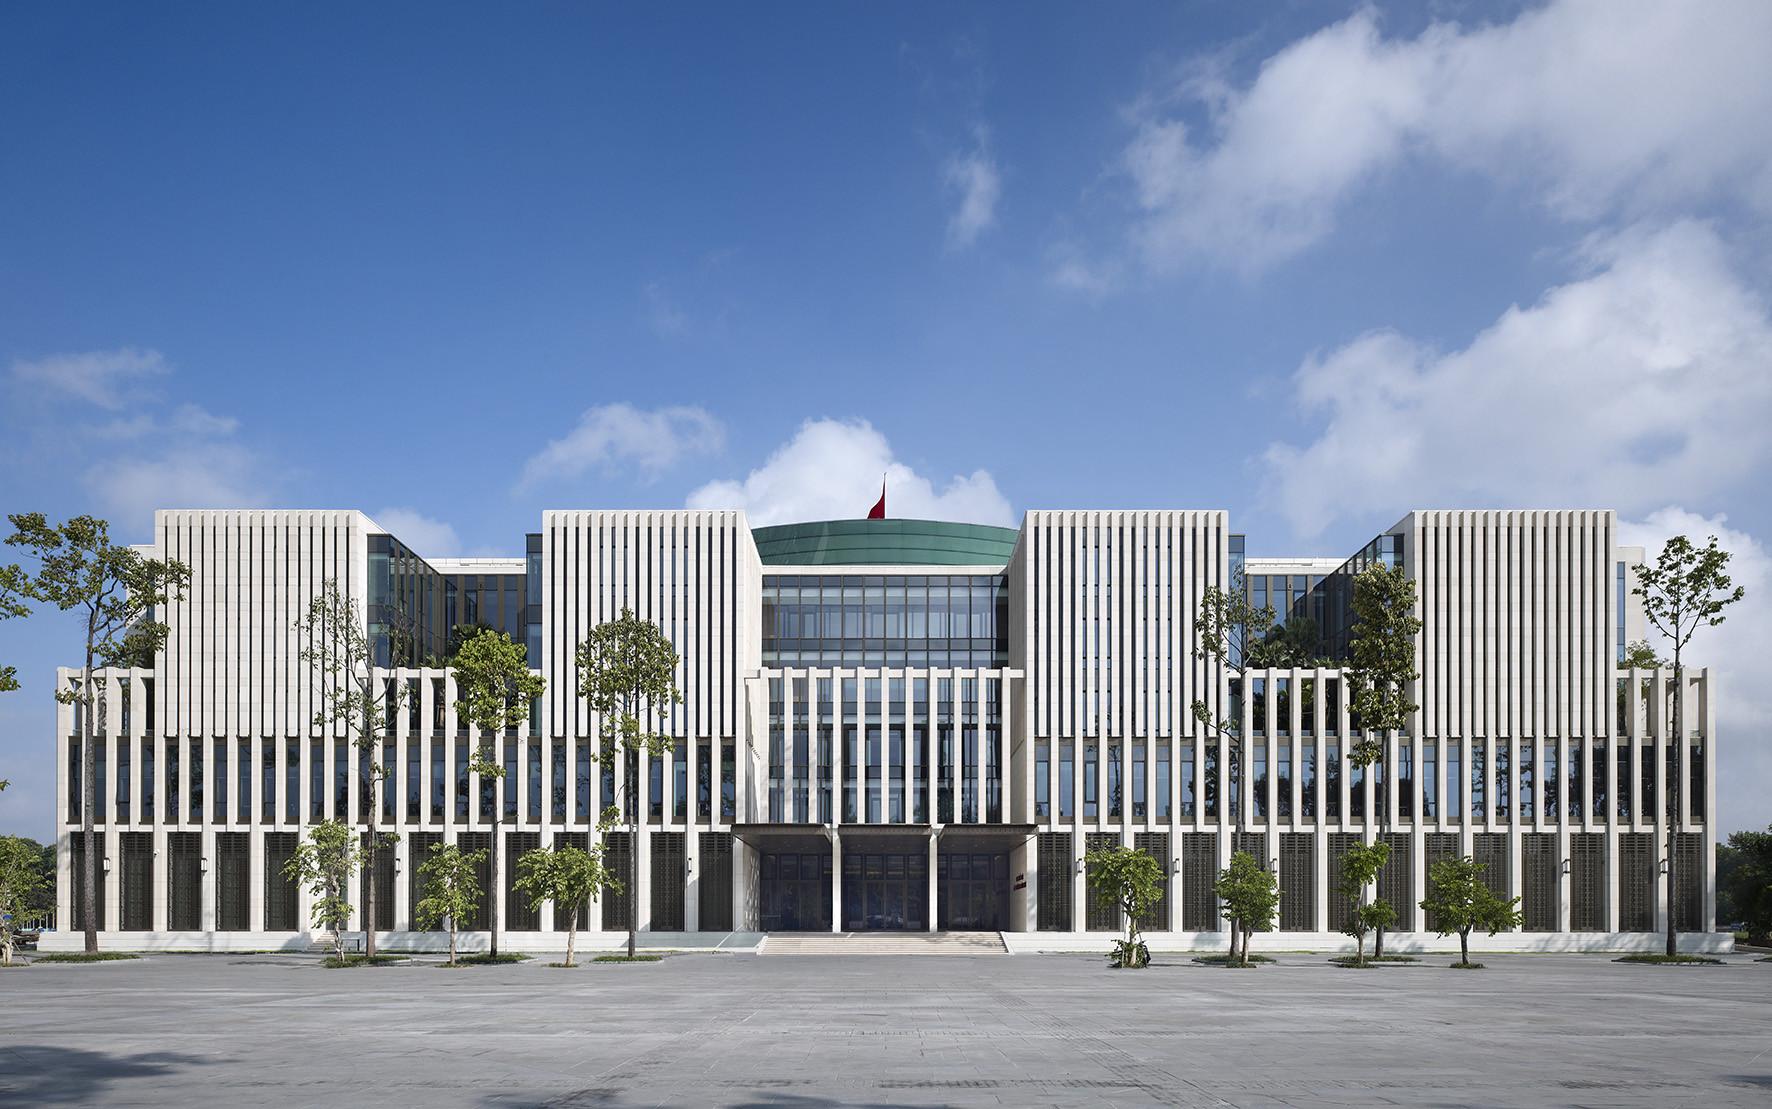 Vietnamese National Assembly in Hanoi / gmp architekten, Courtesy of gmp architekten